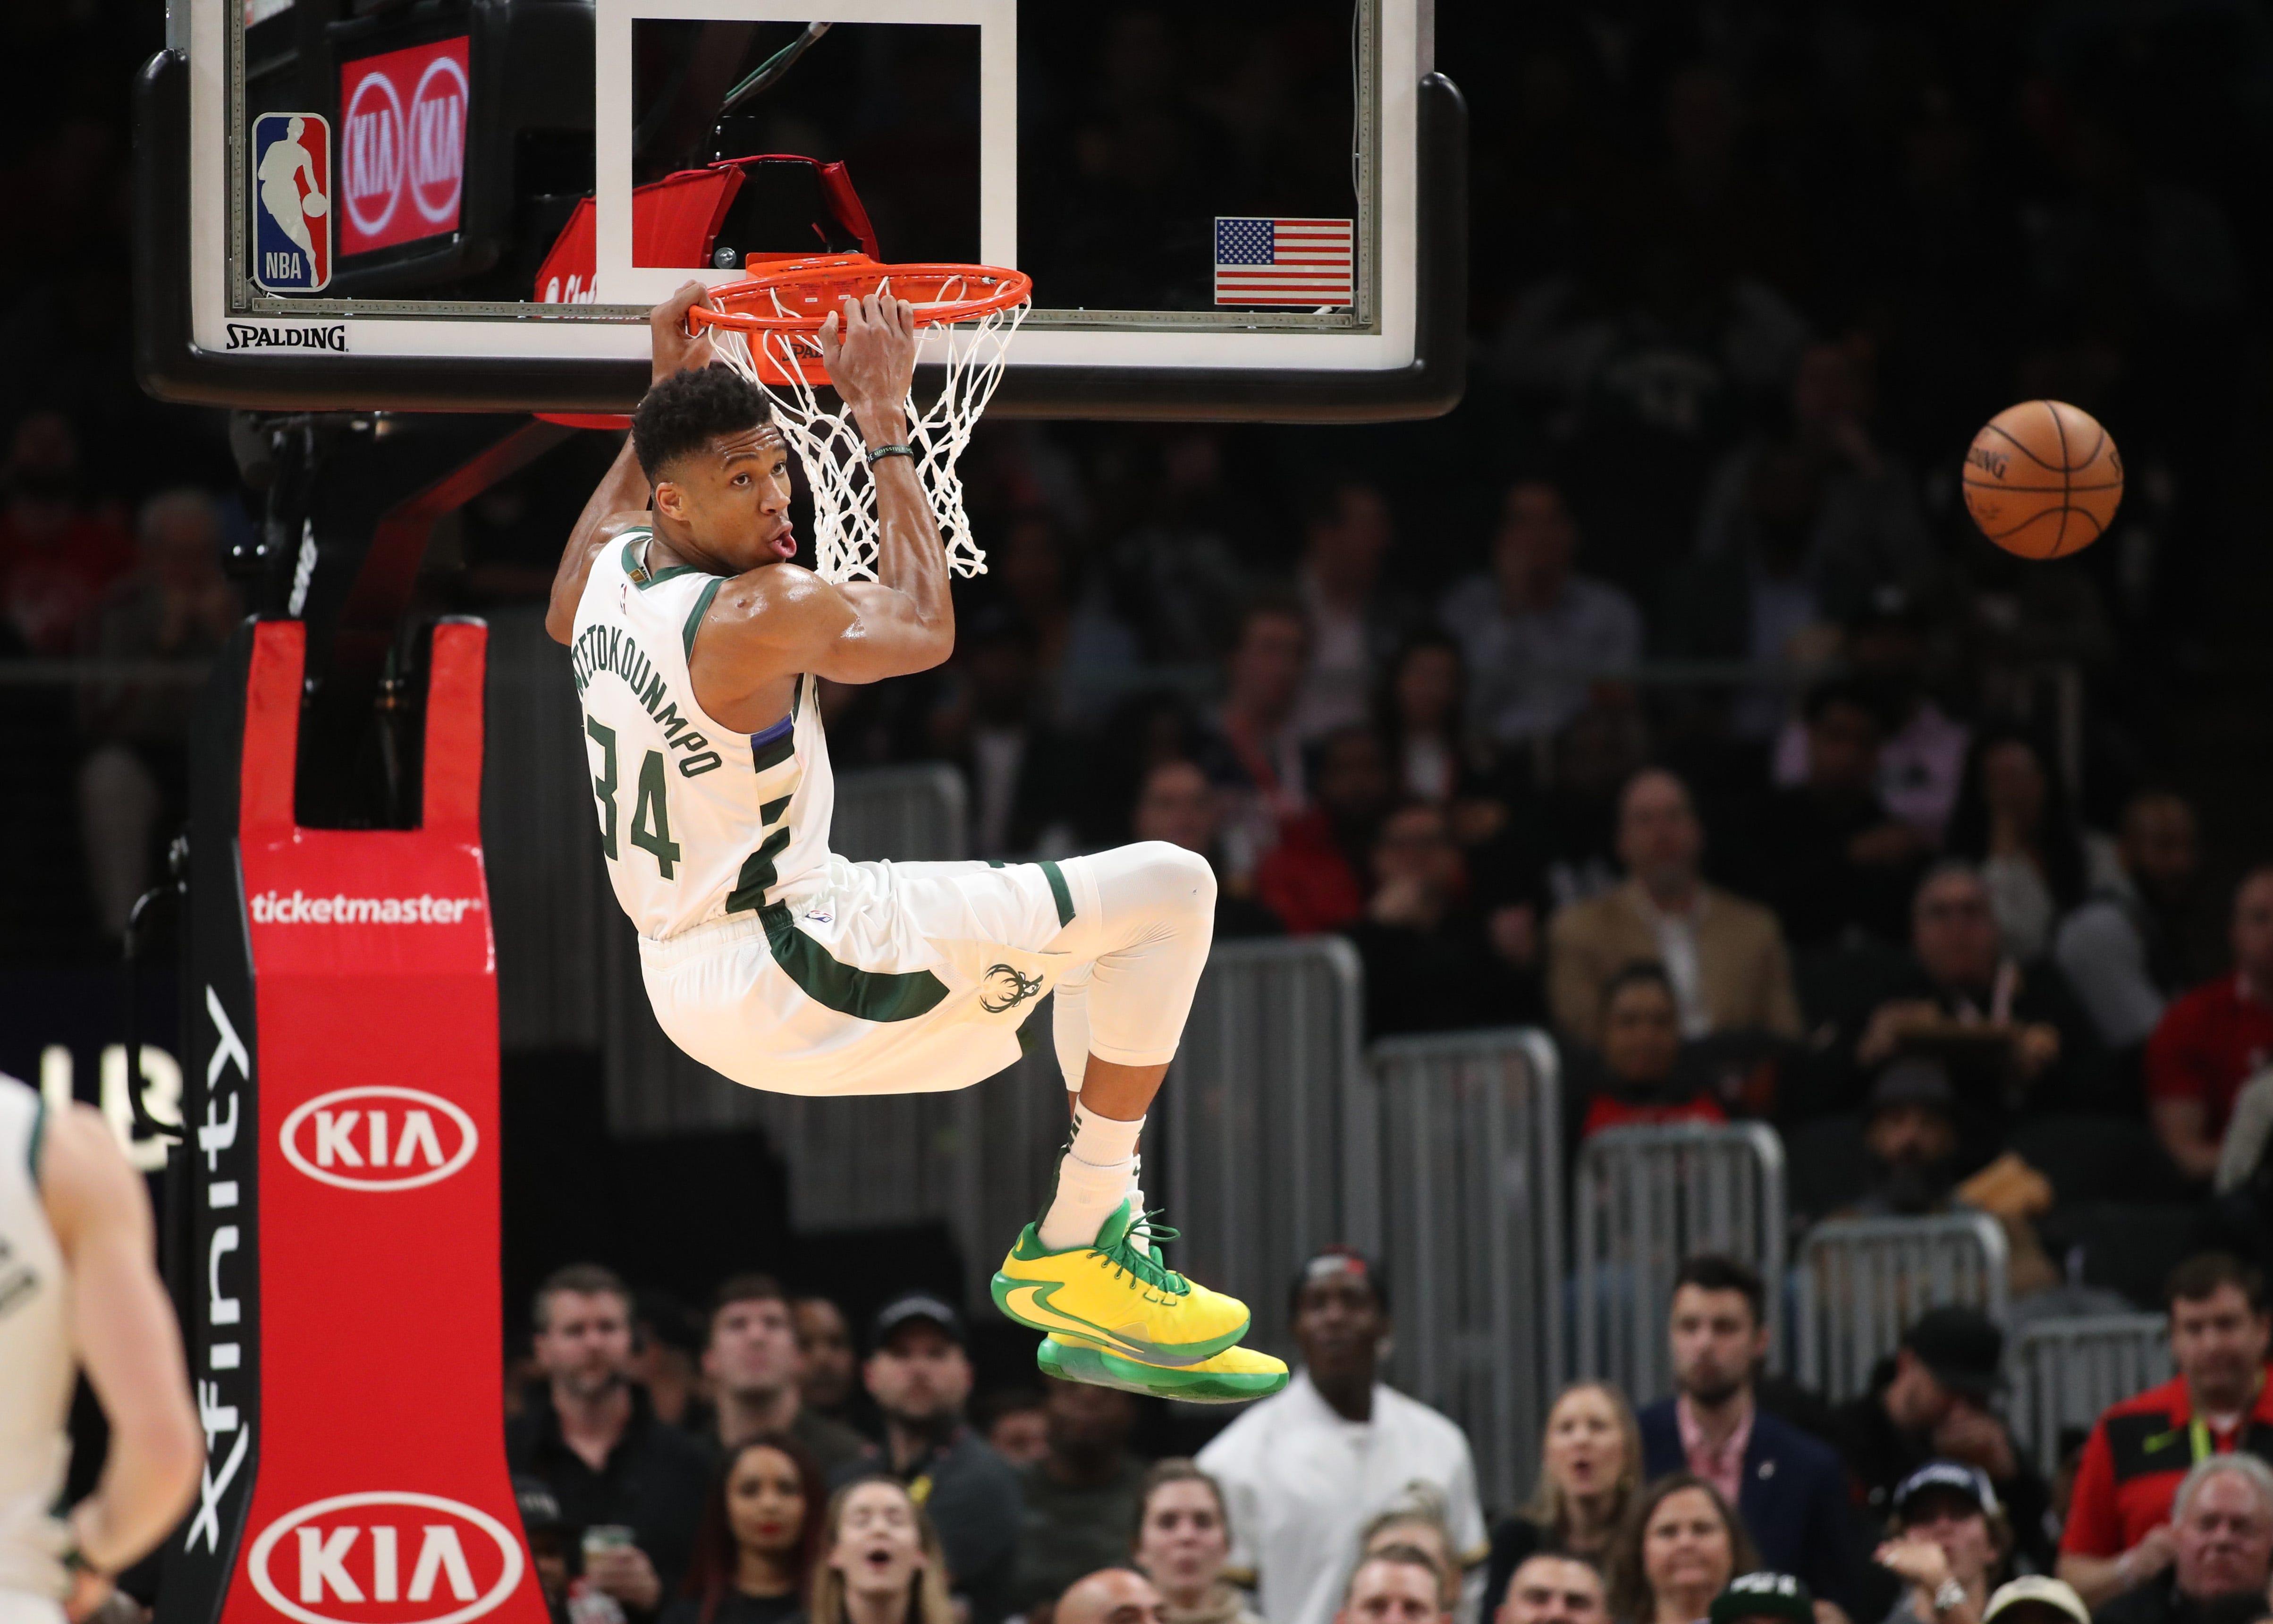 Throw it down! Best dunk photos of the NBA season